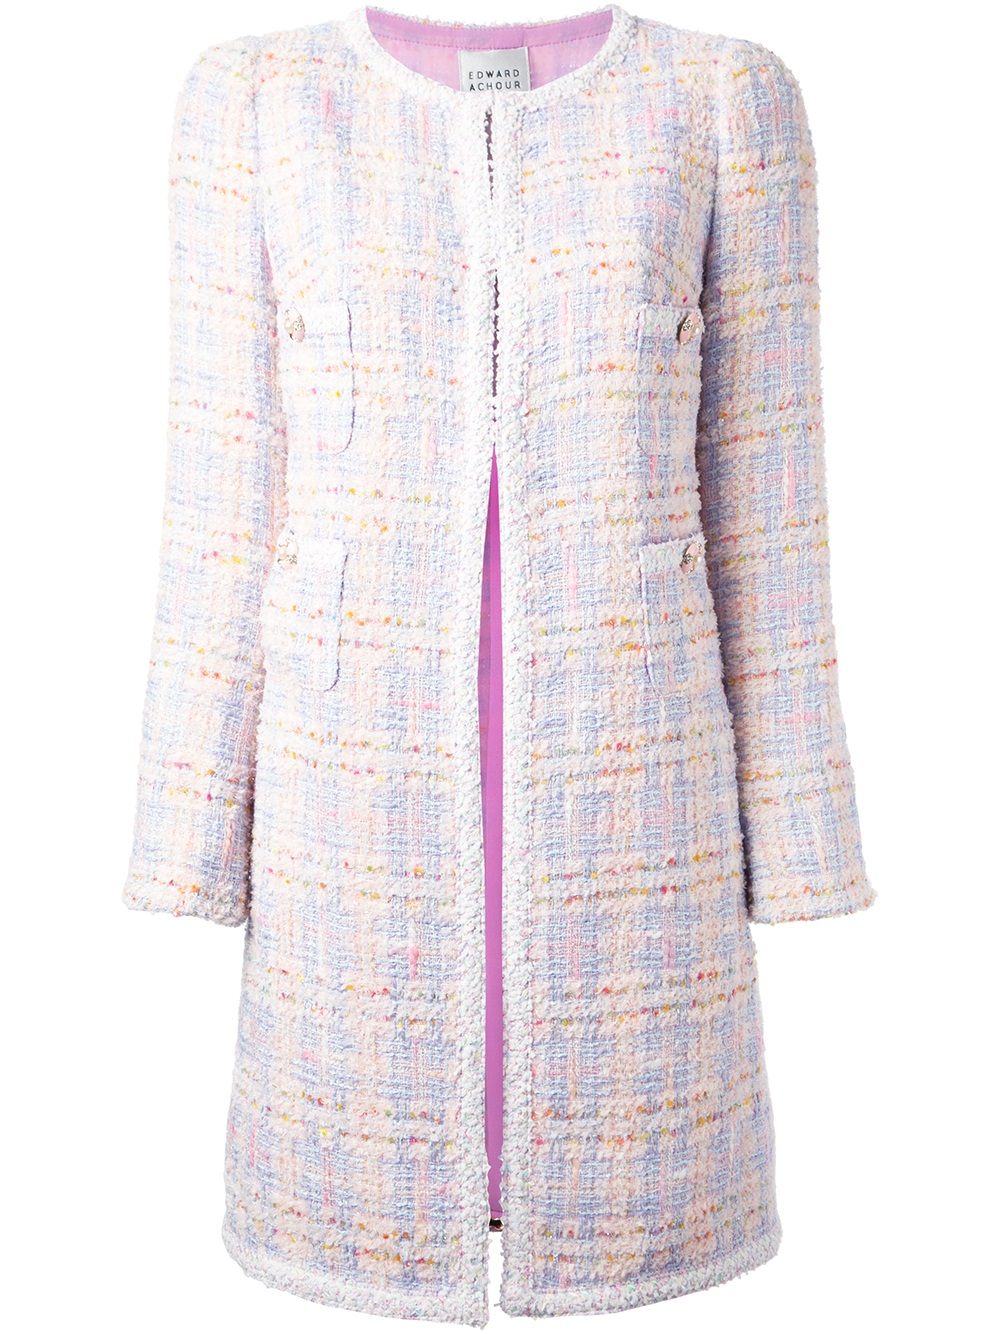 Edward achour paris Tweed Jacket in Purple | Lyst